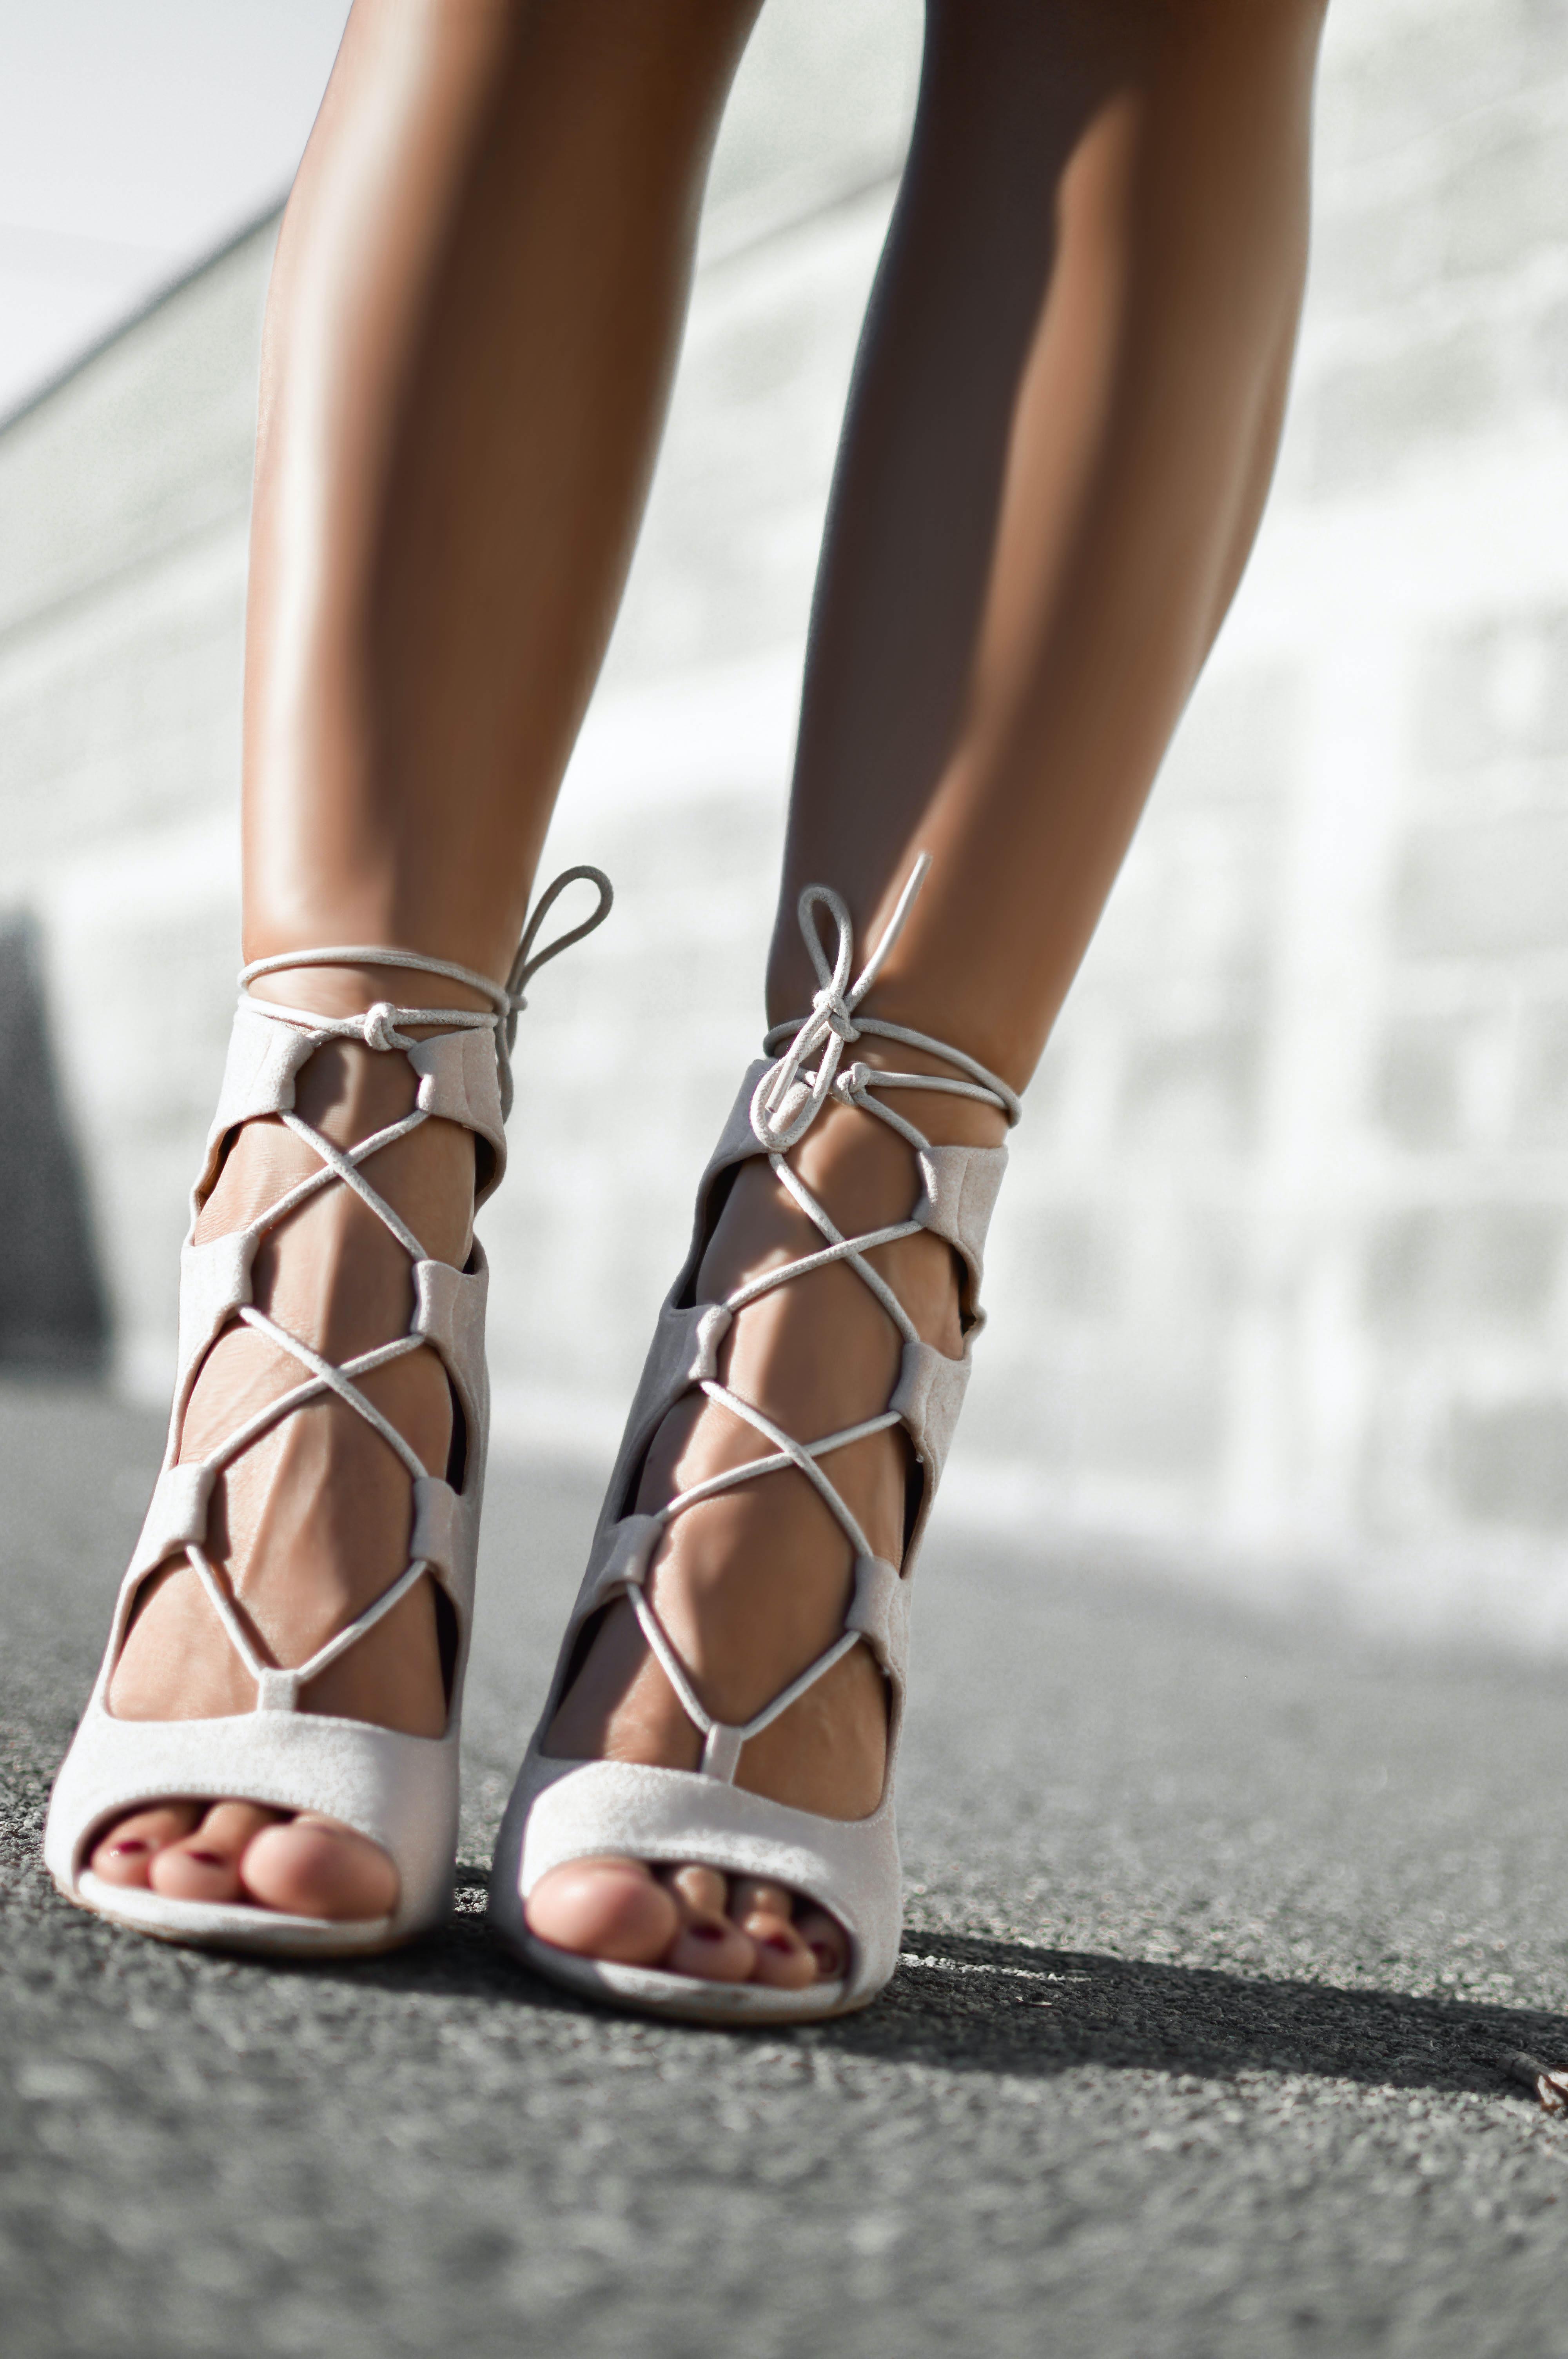 History of high heels fashion 94